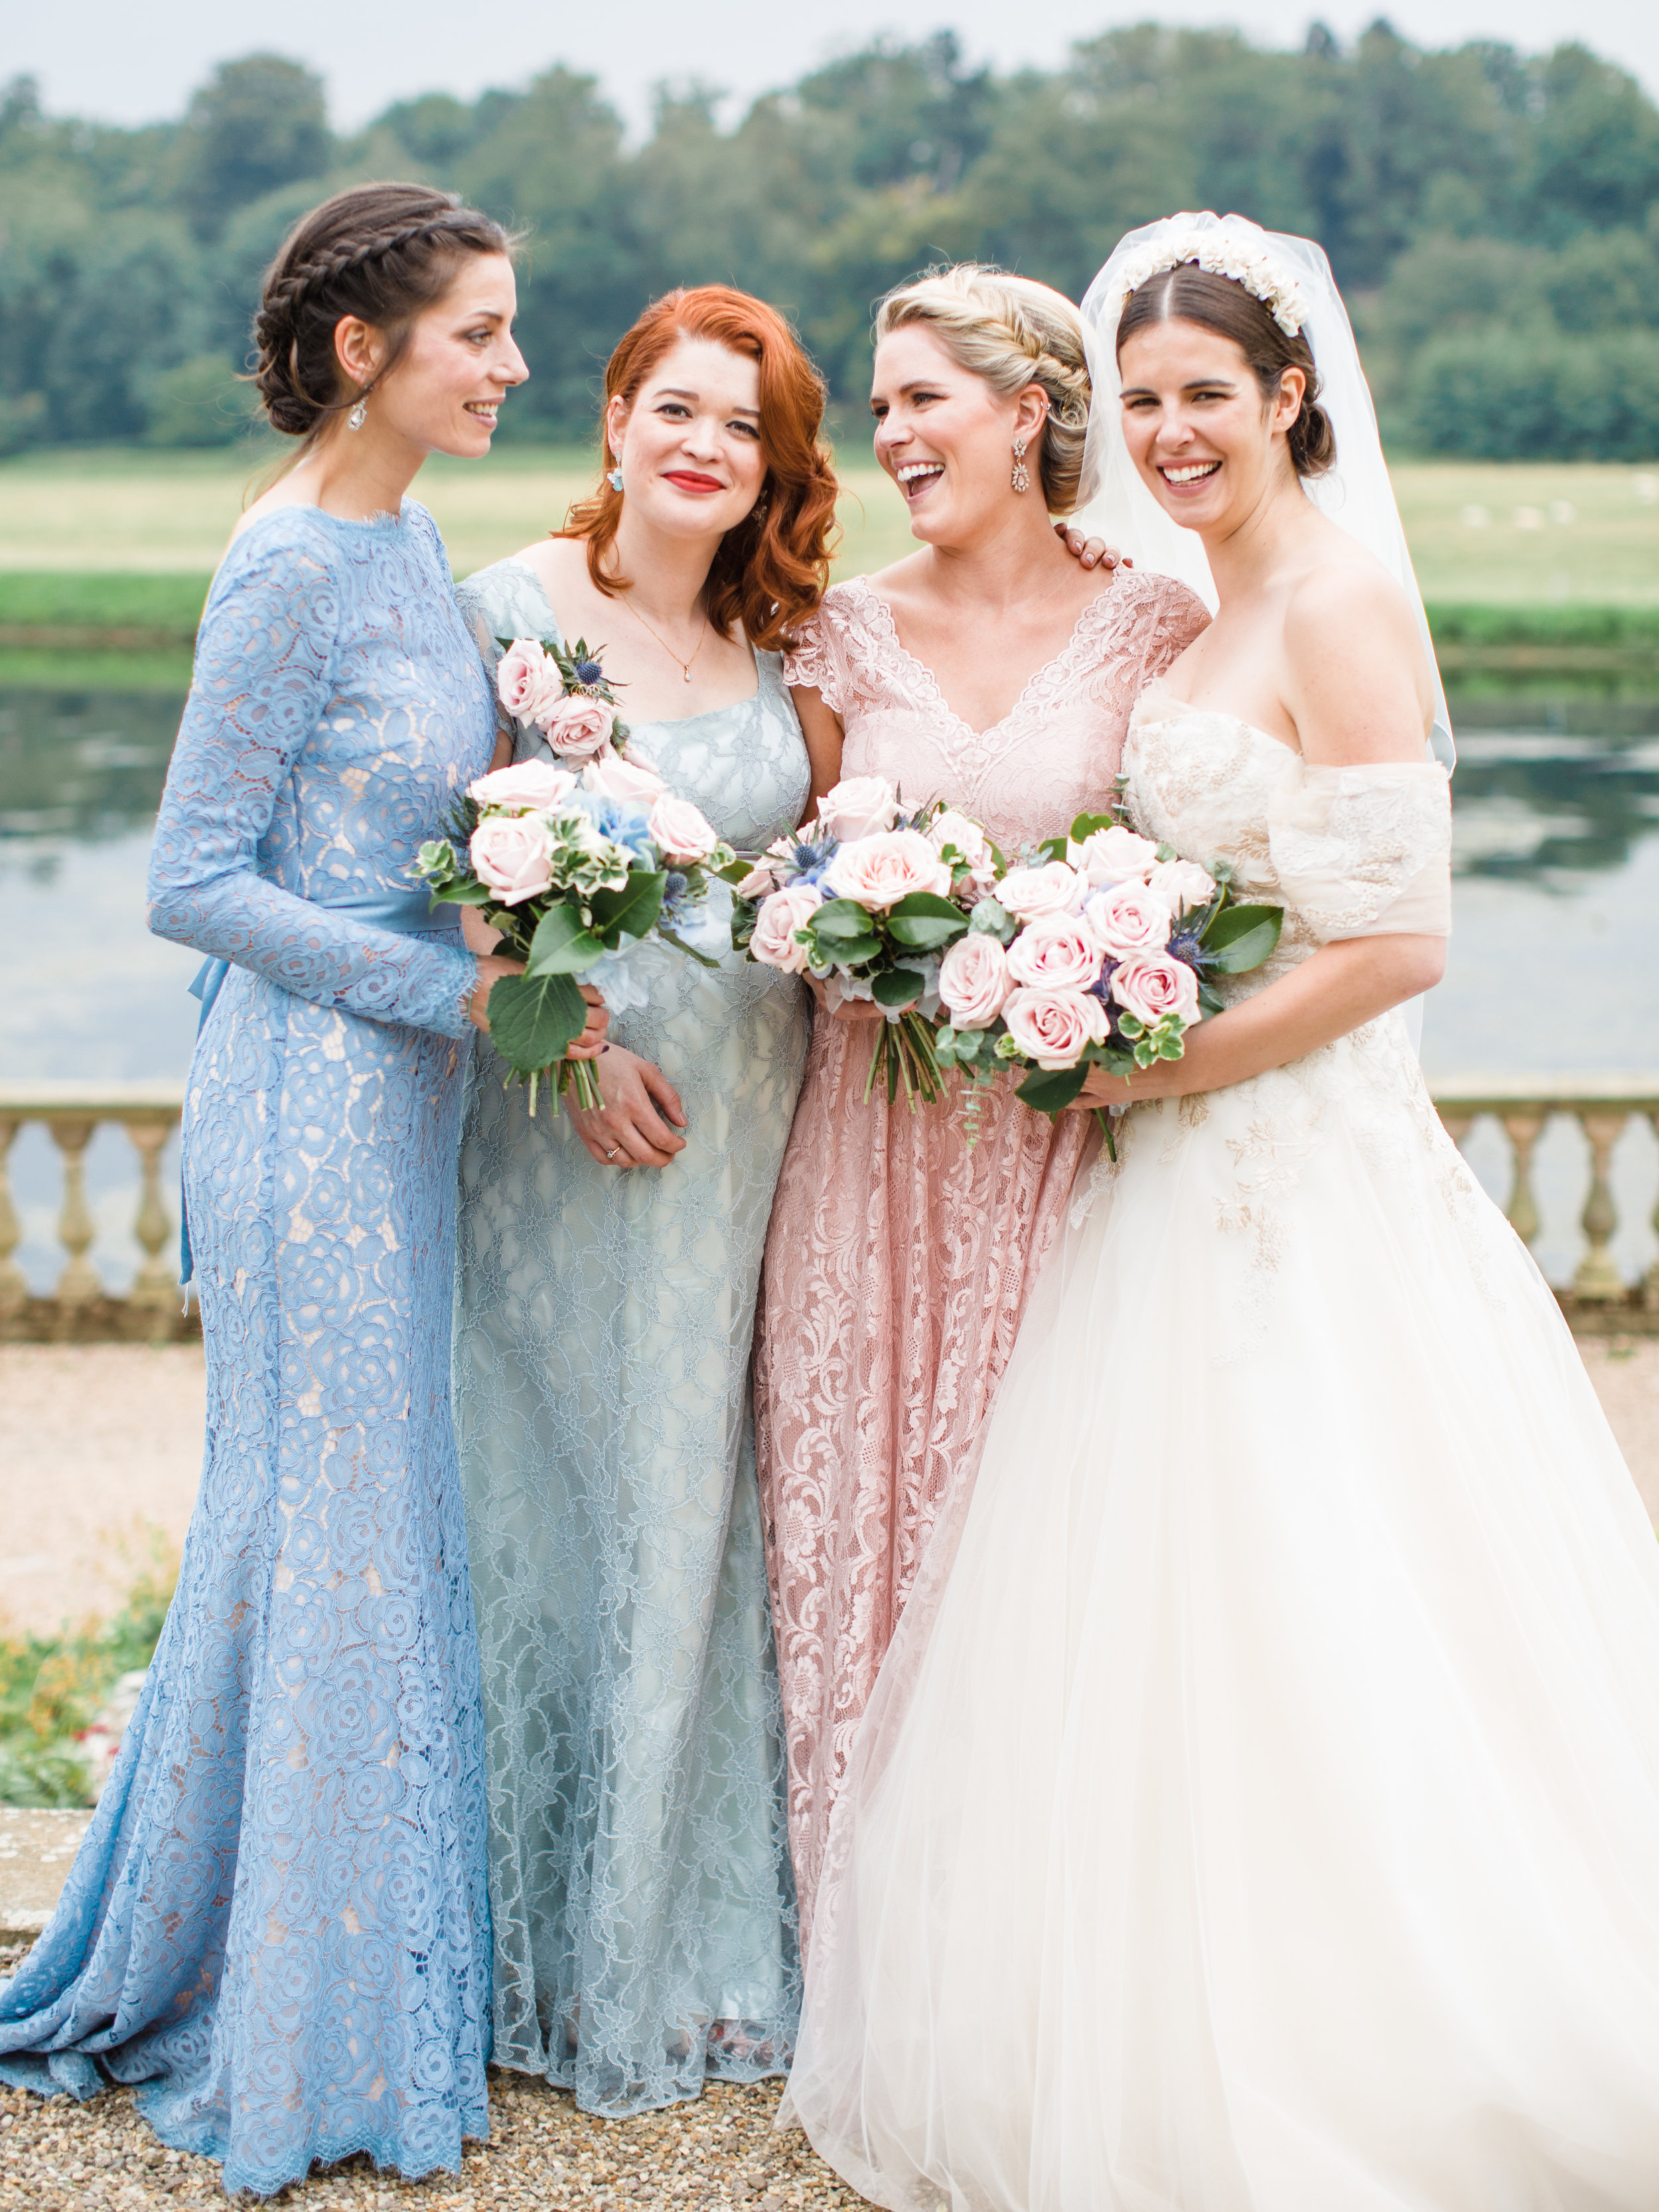 Co-Founder Louie's Wedding at Stoneleigh Abbey - Photo:  Amy O'Boyle